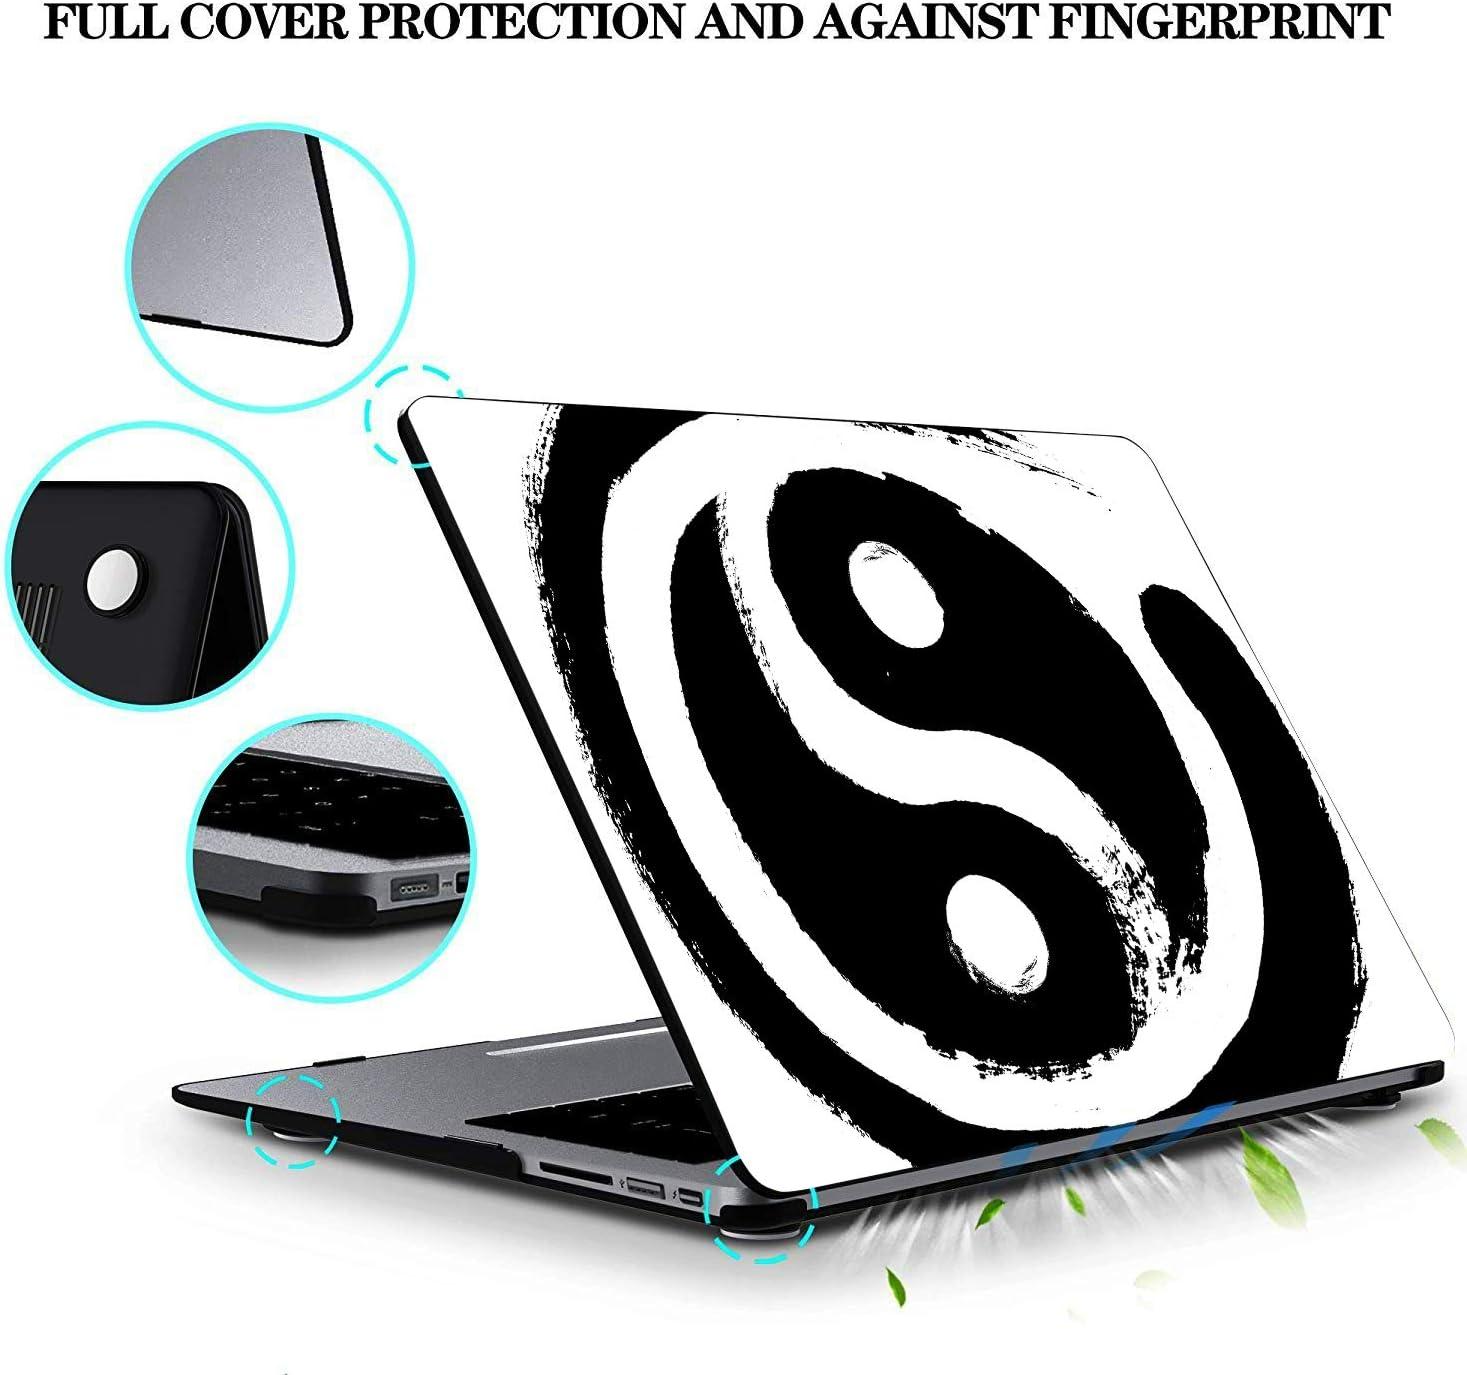 Case Macbook Air Chinese Yin Yang Tao Mandala Element Plastic Hard Shell Compatible Mac Air 11 Pro 13 15 Mac Cover Protection For Macbook 2016-2019 Version